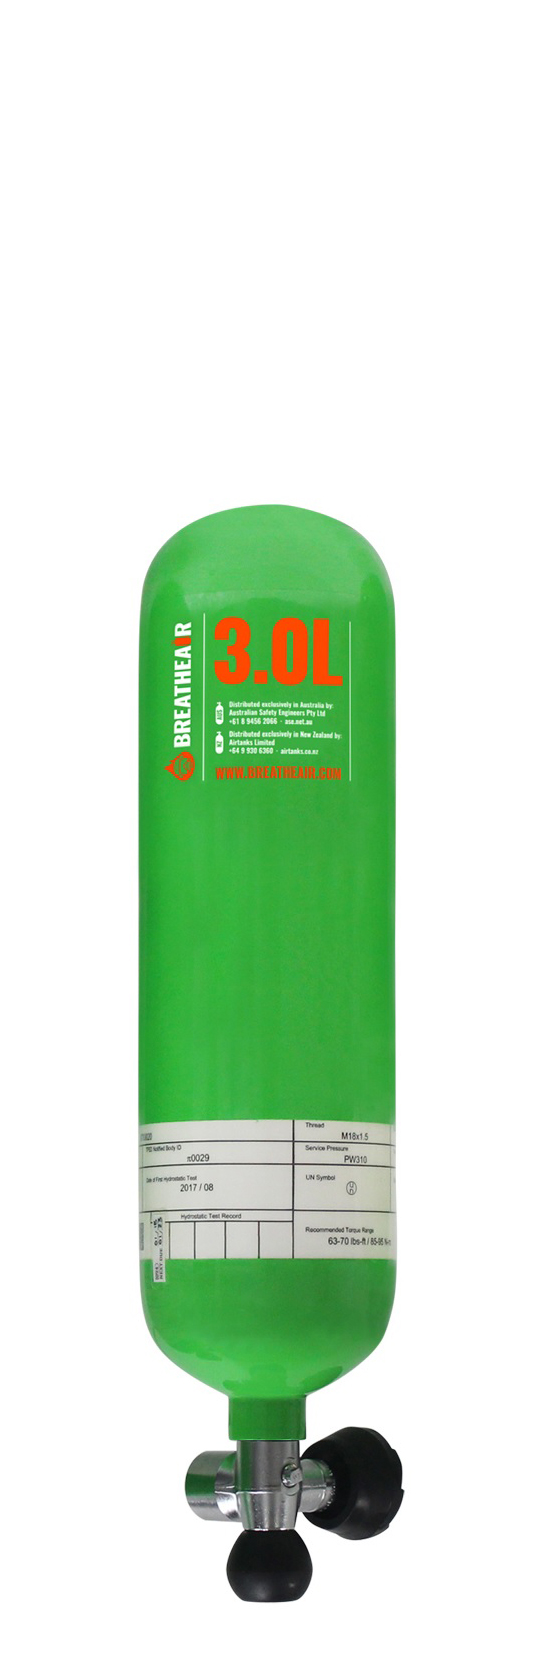 3L EEBD Cylinder with Valve